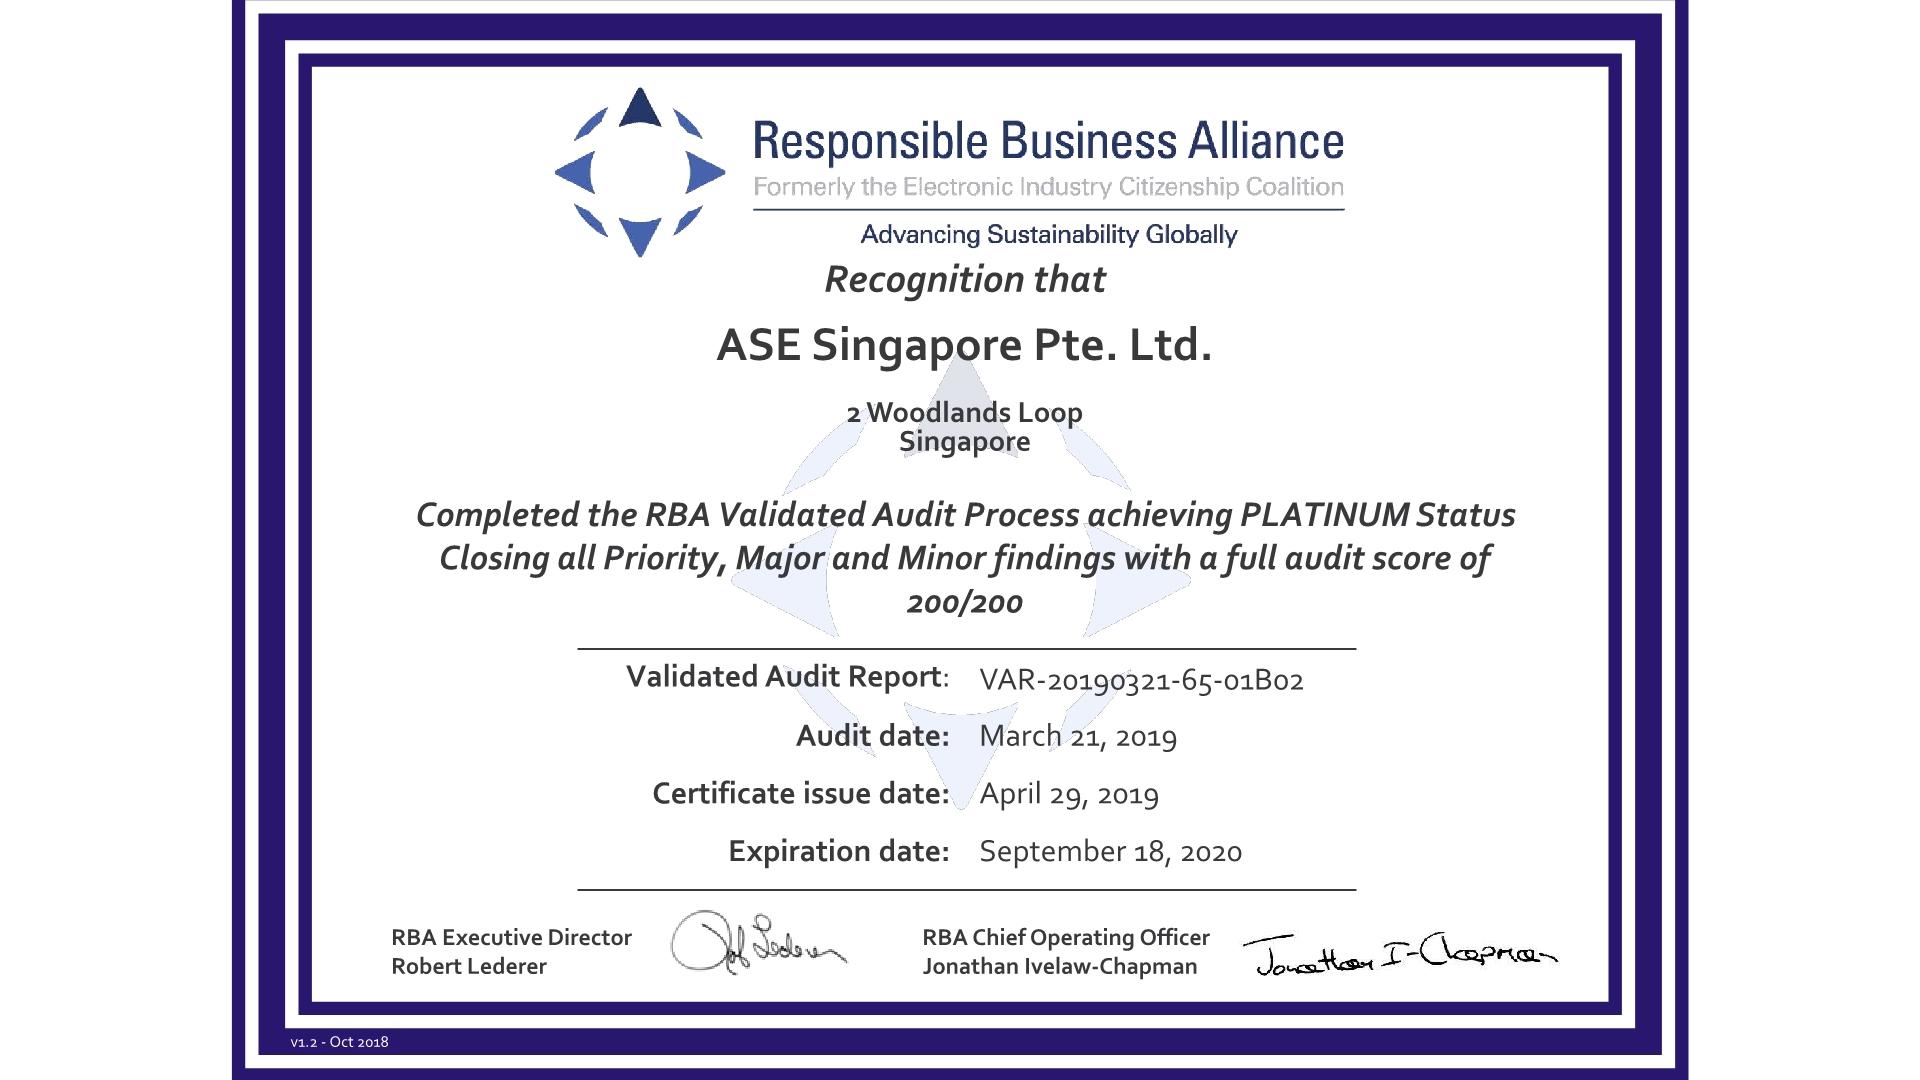 certification certificate singapore rba ase